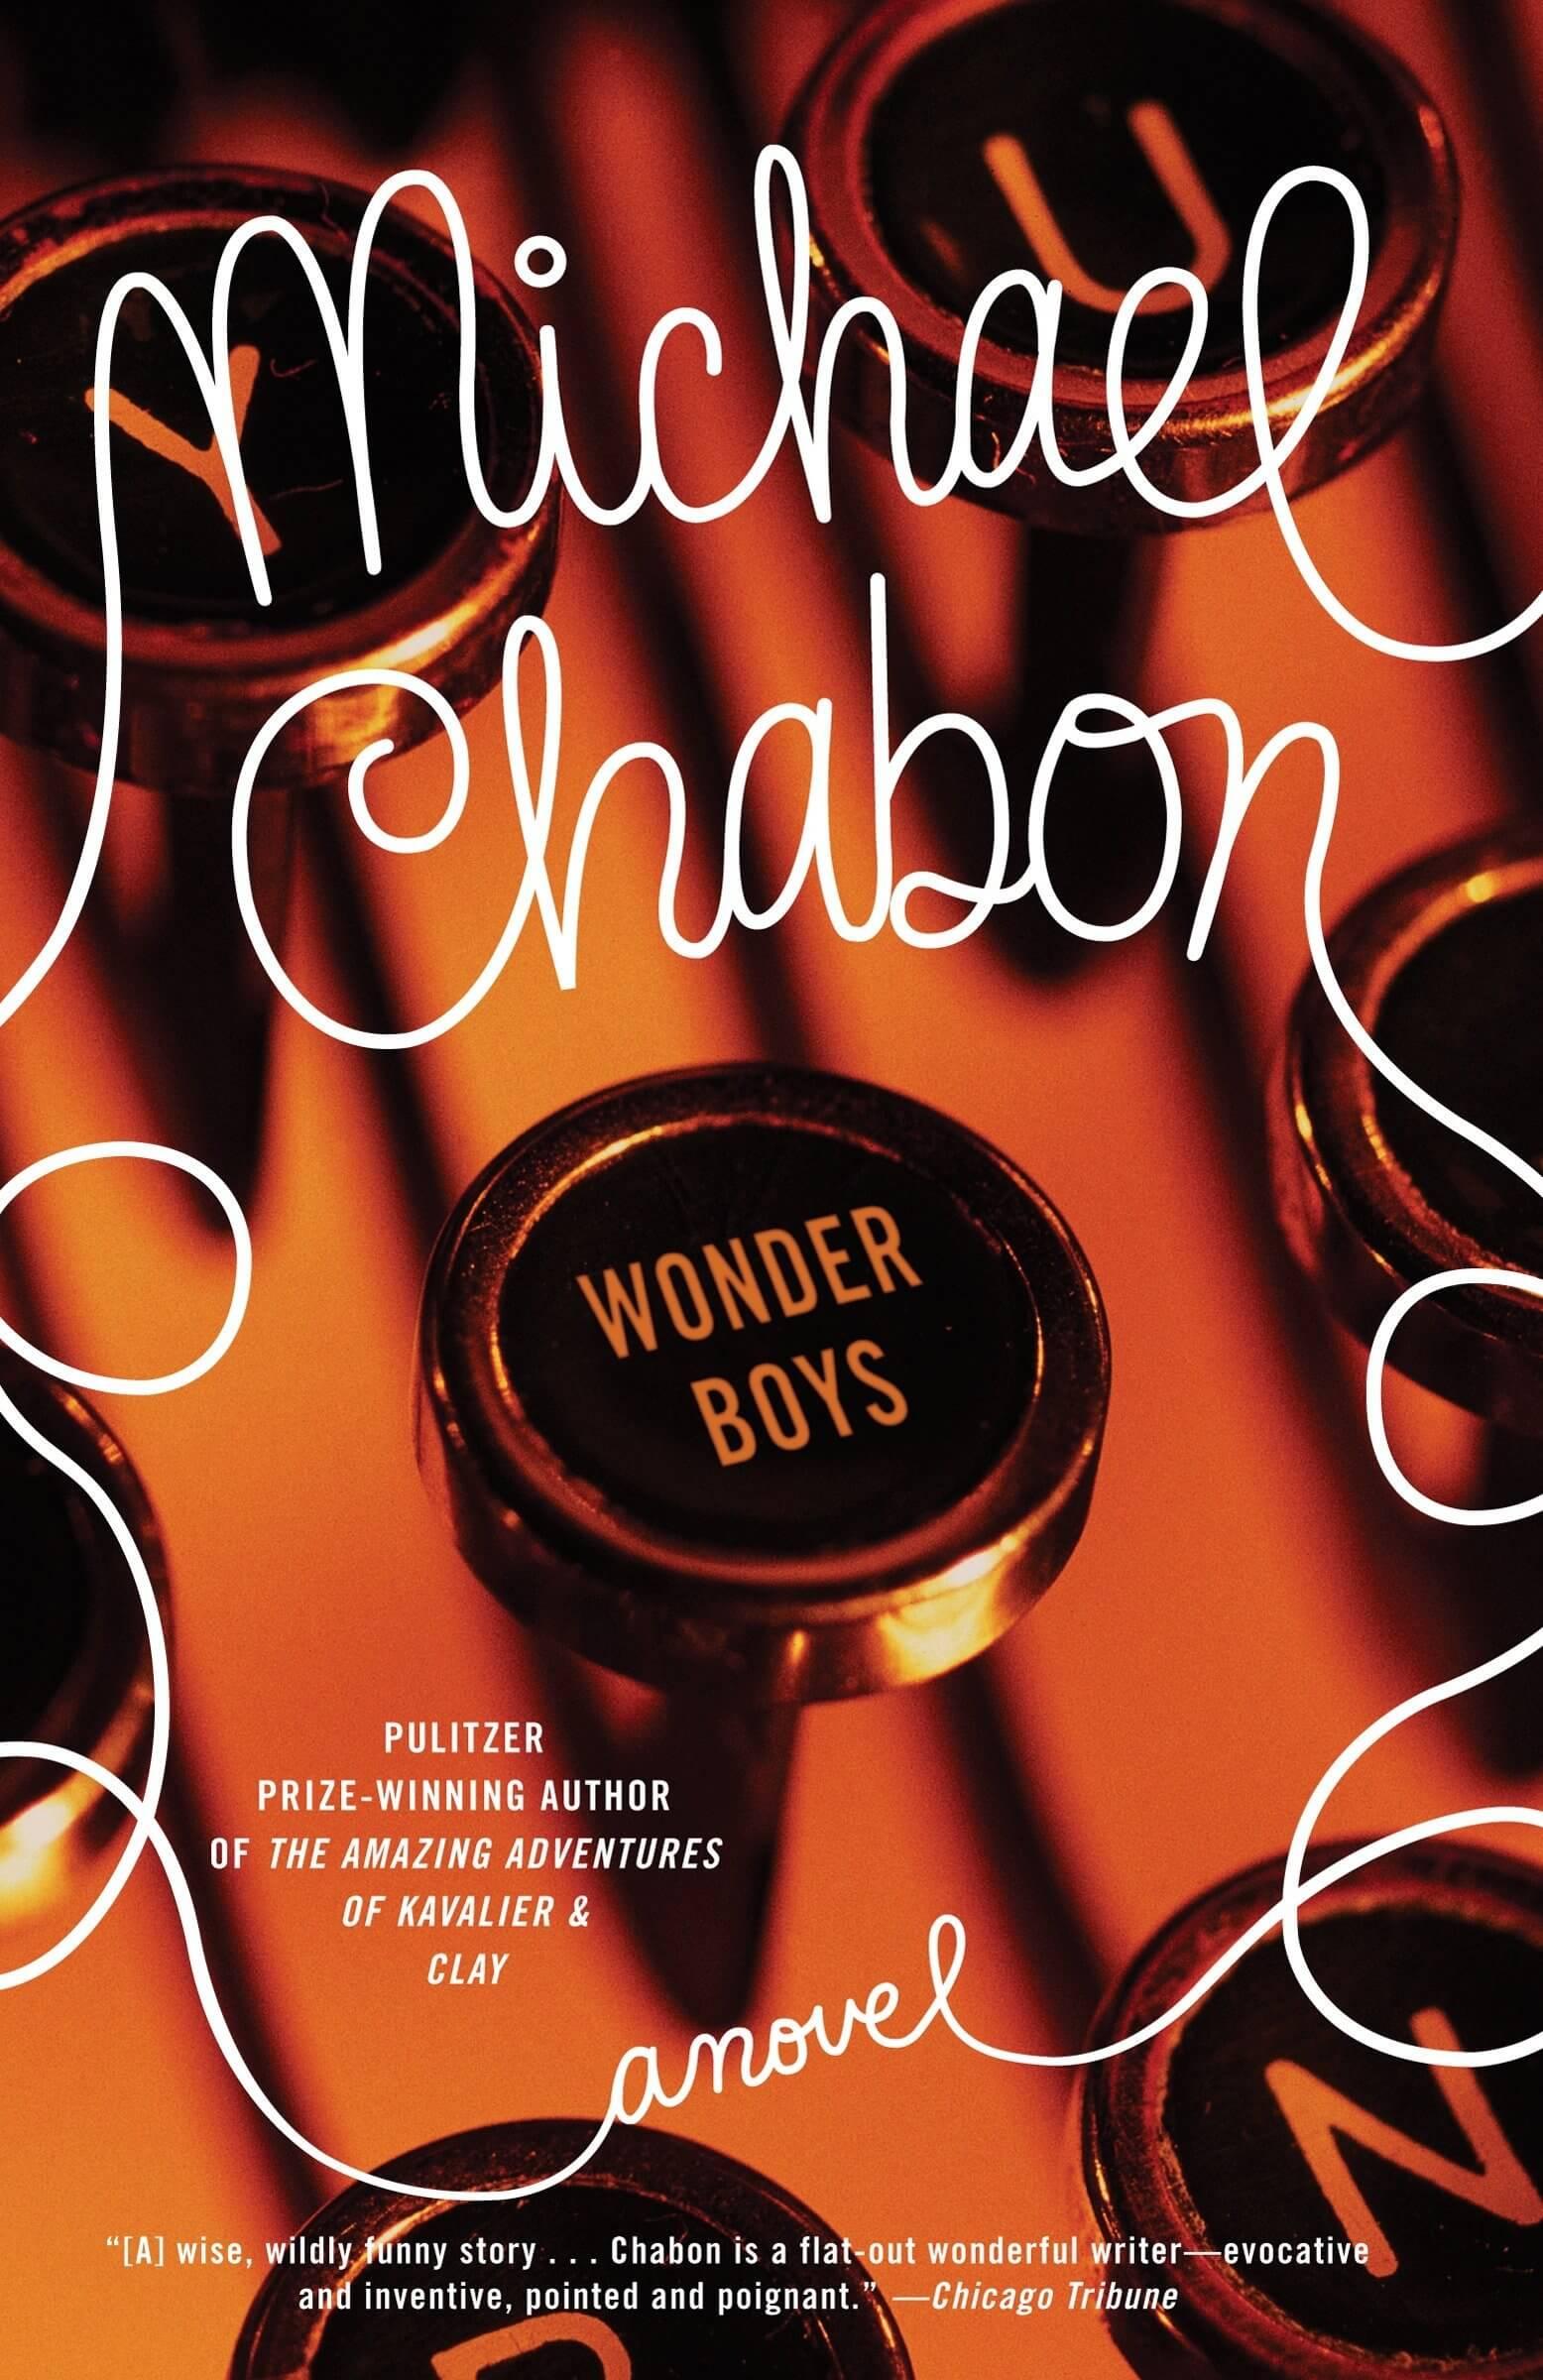 Wonder Boys book cover image